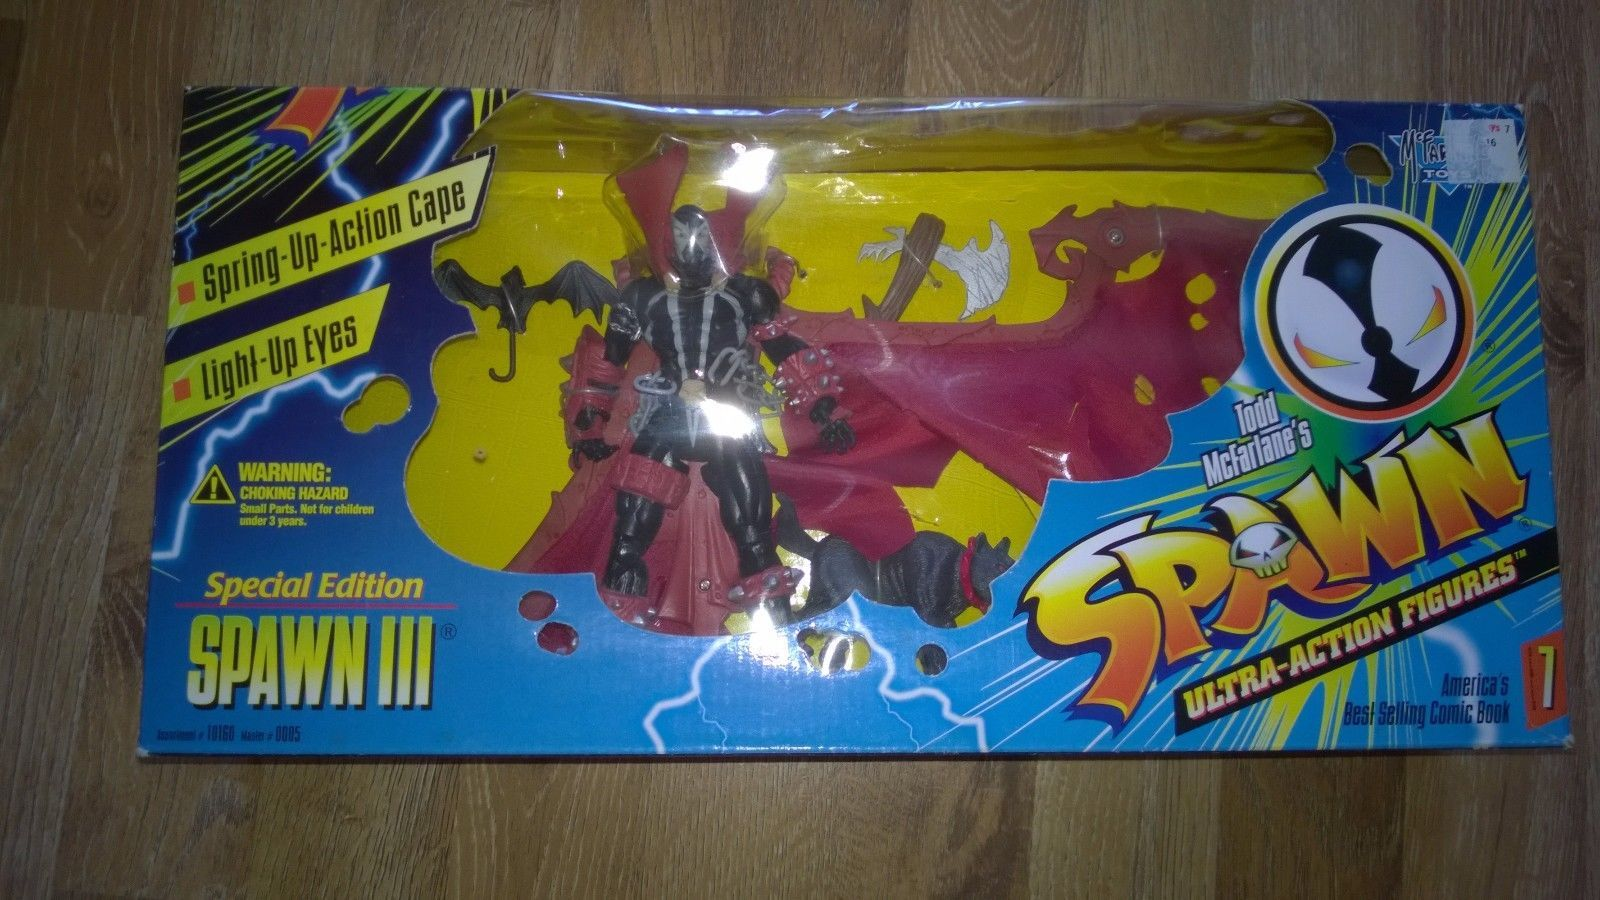 McFarlane Toys Spawn III  Spawn Action Figure Series 7 NIB